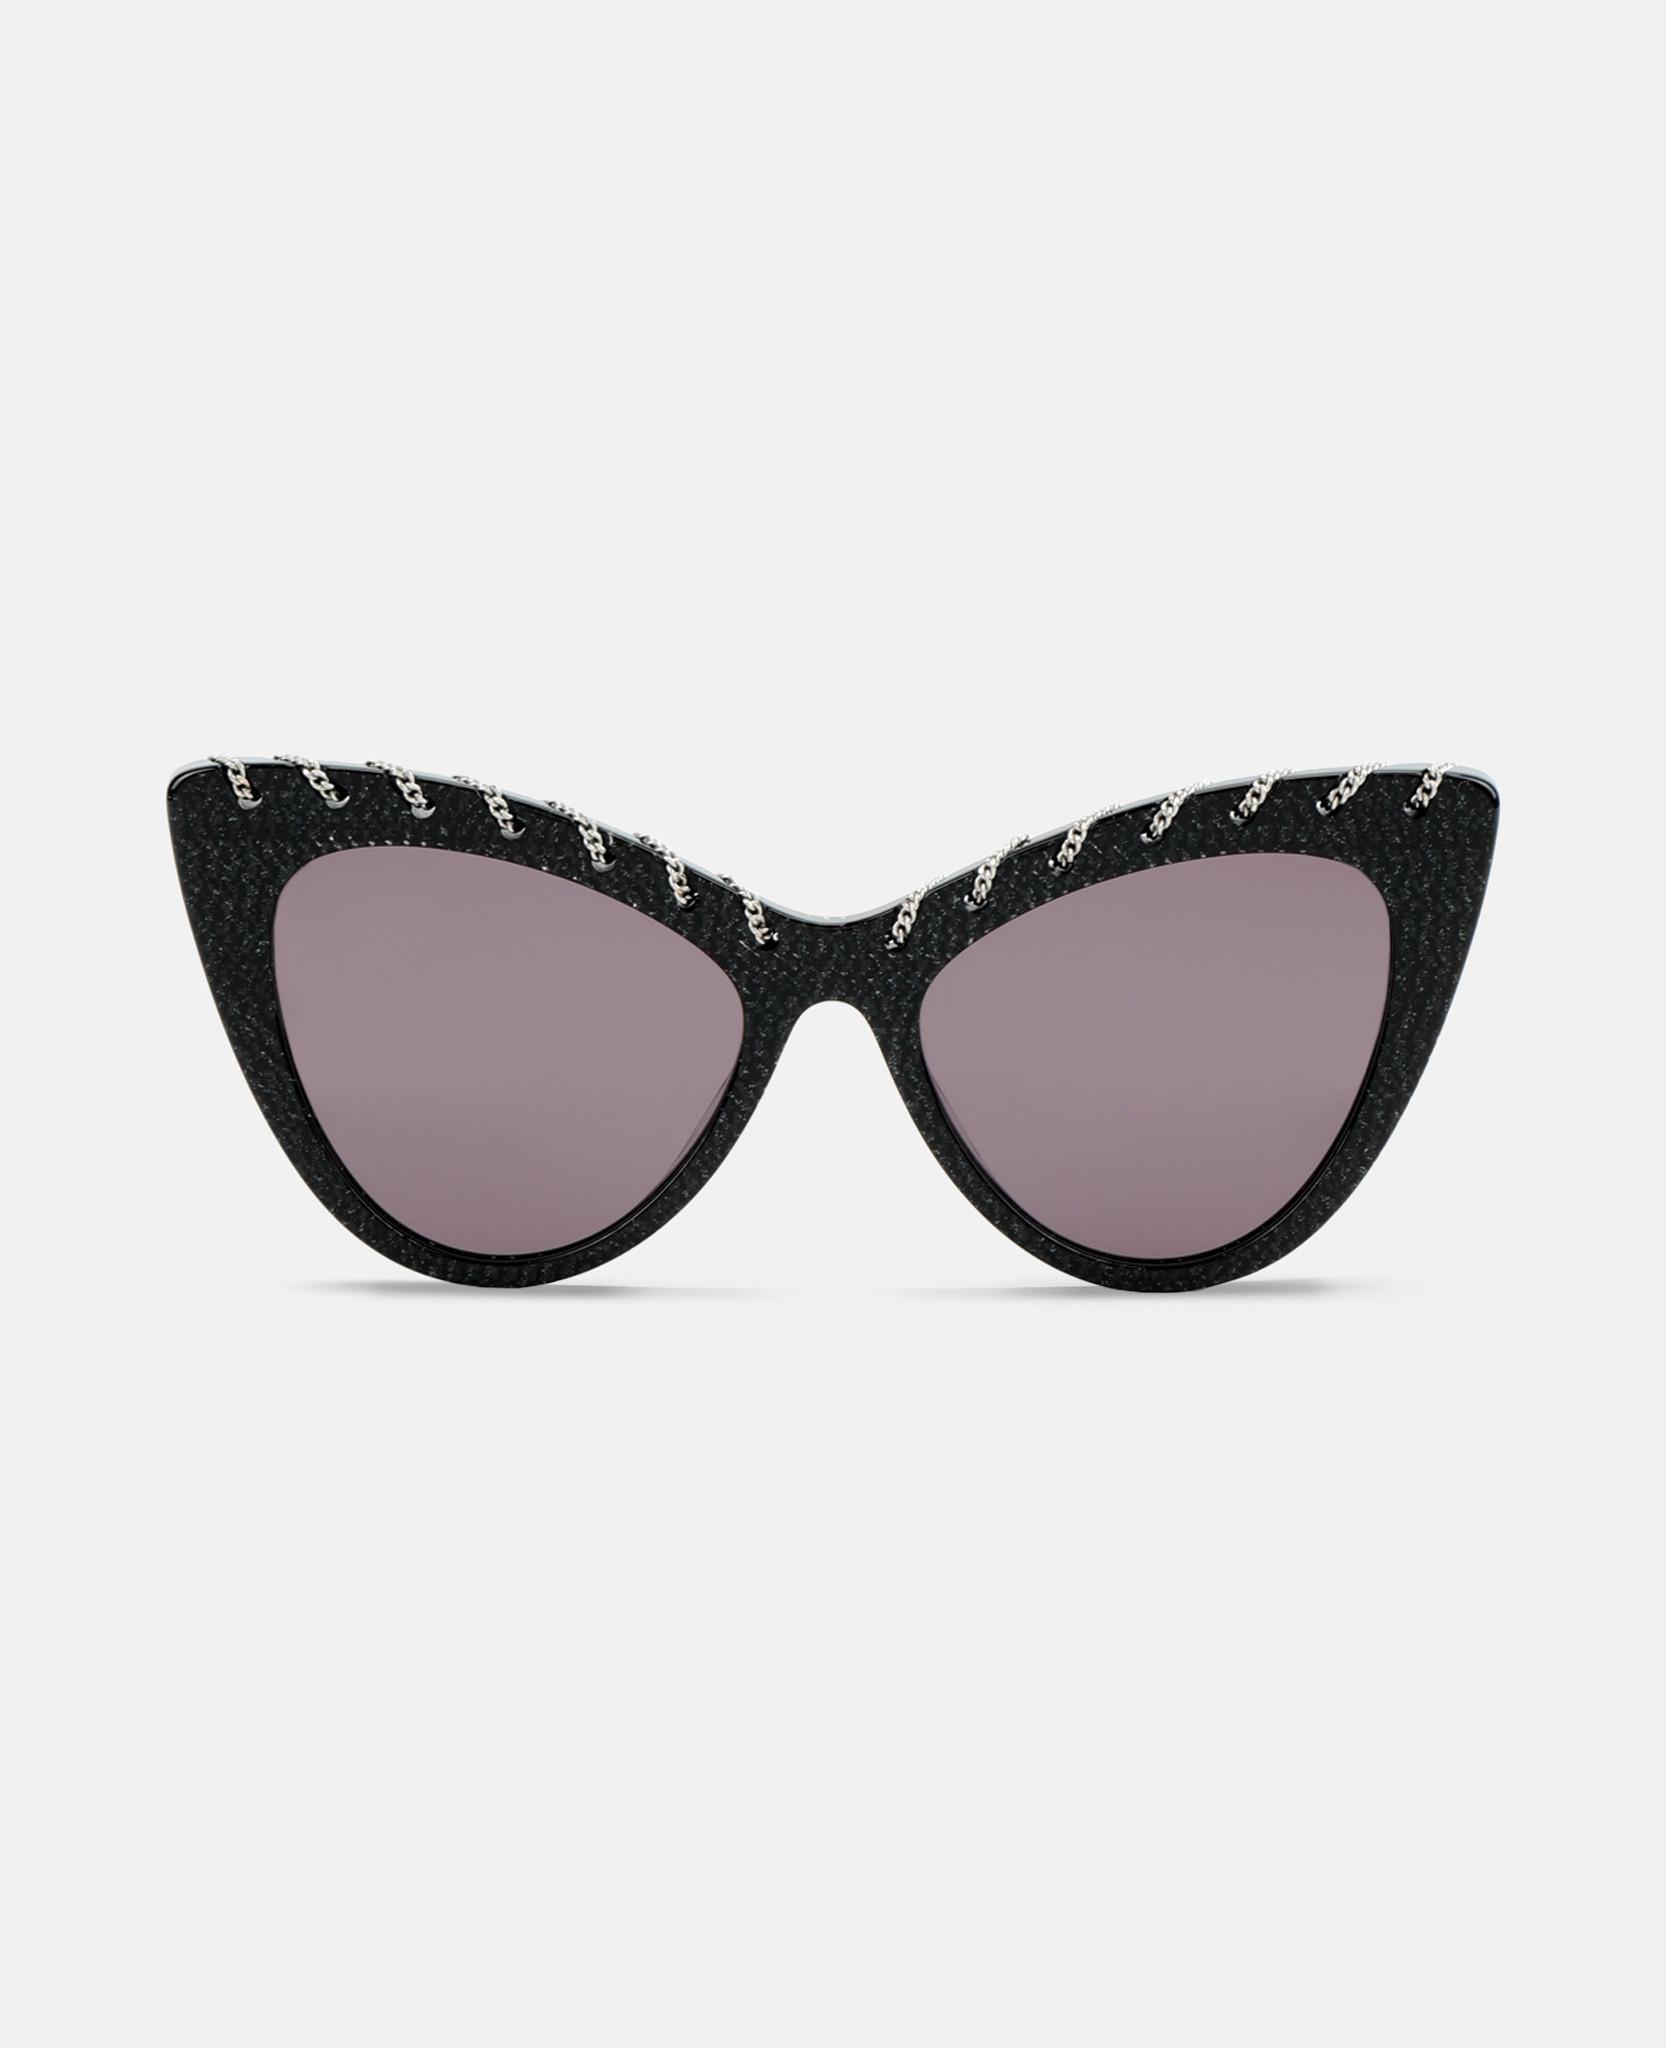 070217650775 Lyst - Stella Mccartney Eyewear in Black